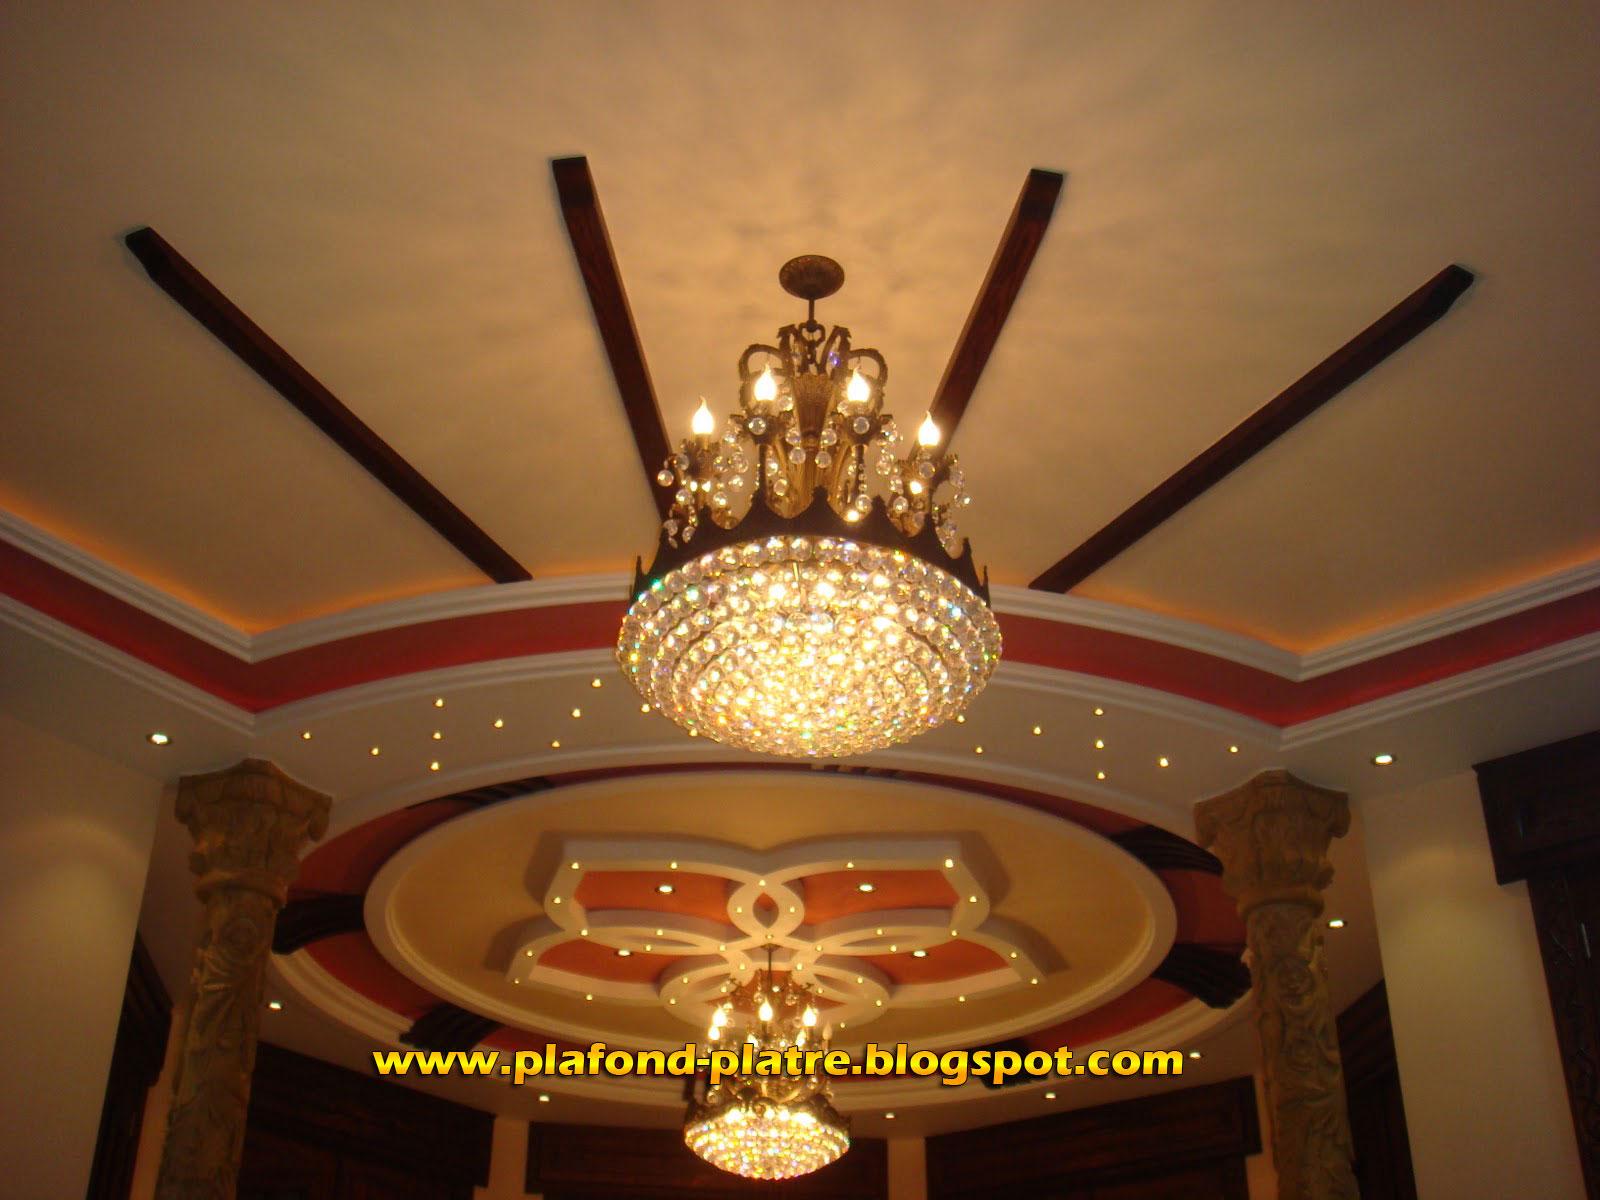 Decoration plafond platre design maroc for Dicor platre 2015